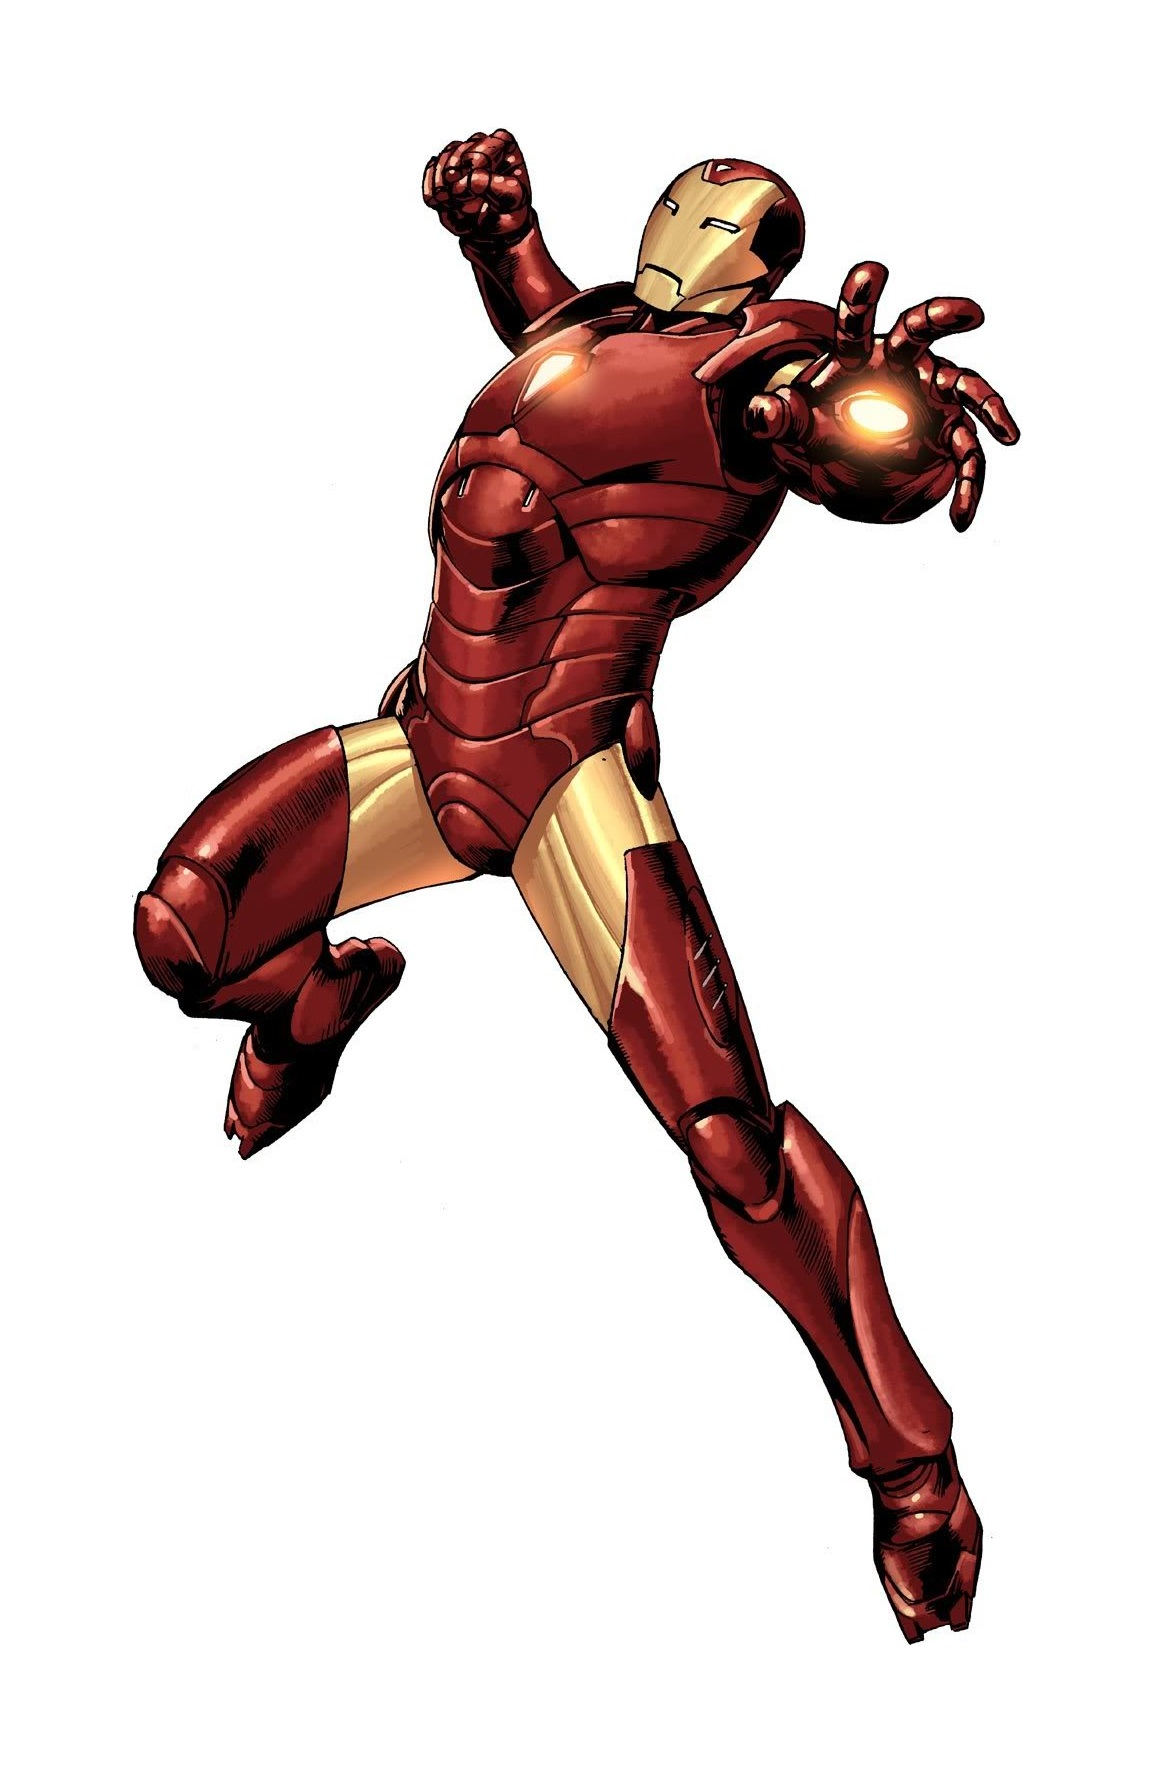 Iron man model 29